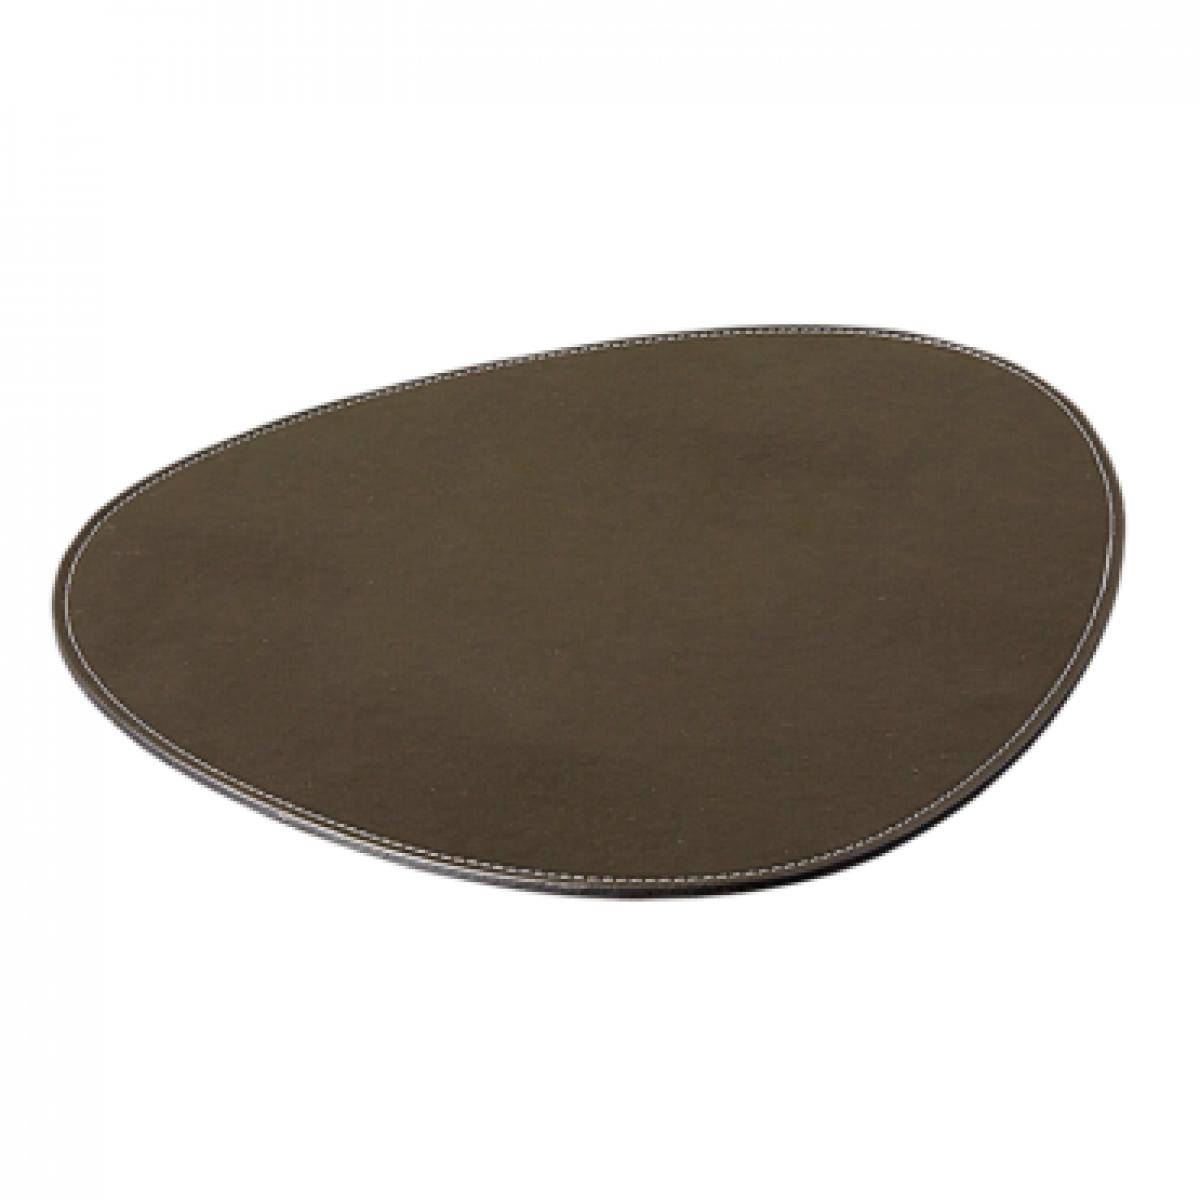 DACORE Dækkeserviet oval mørkebrun læderlook